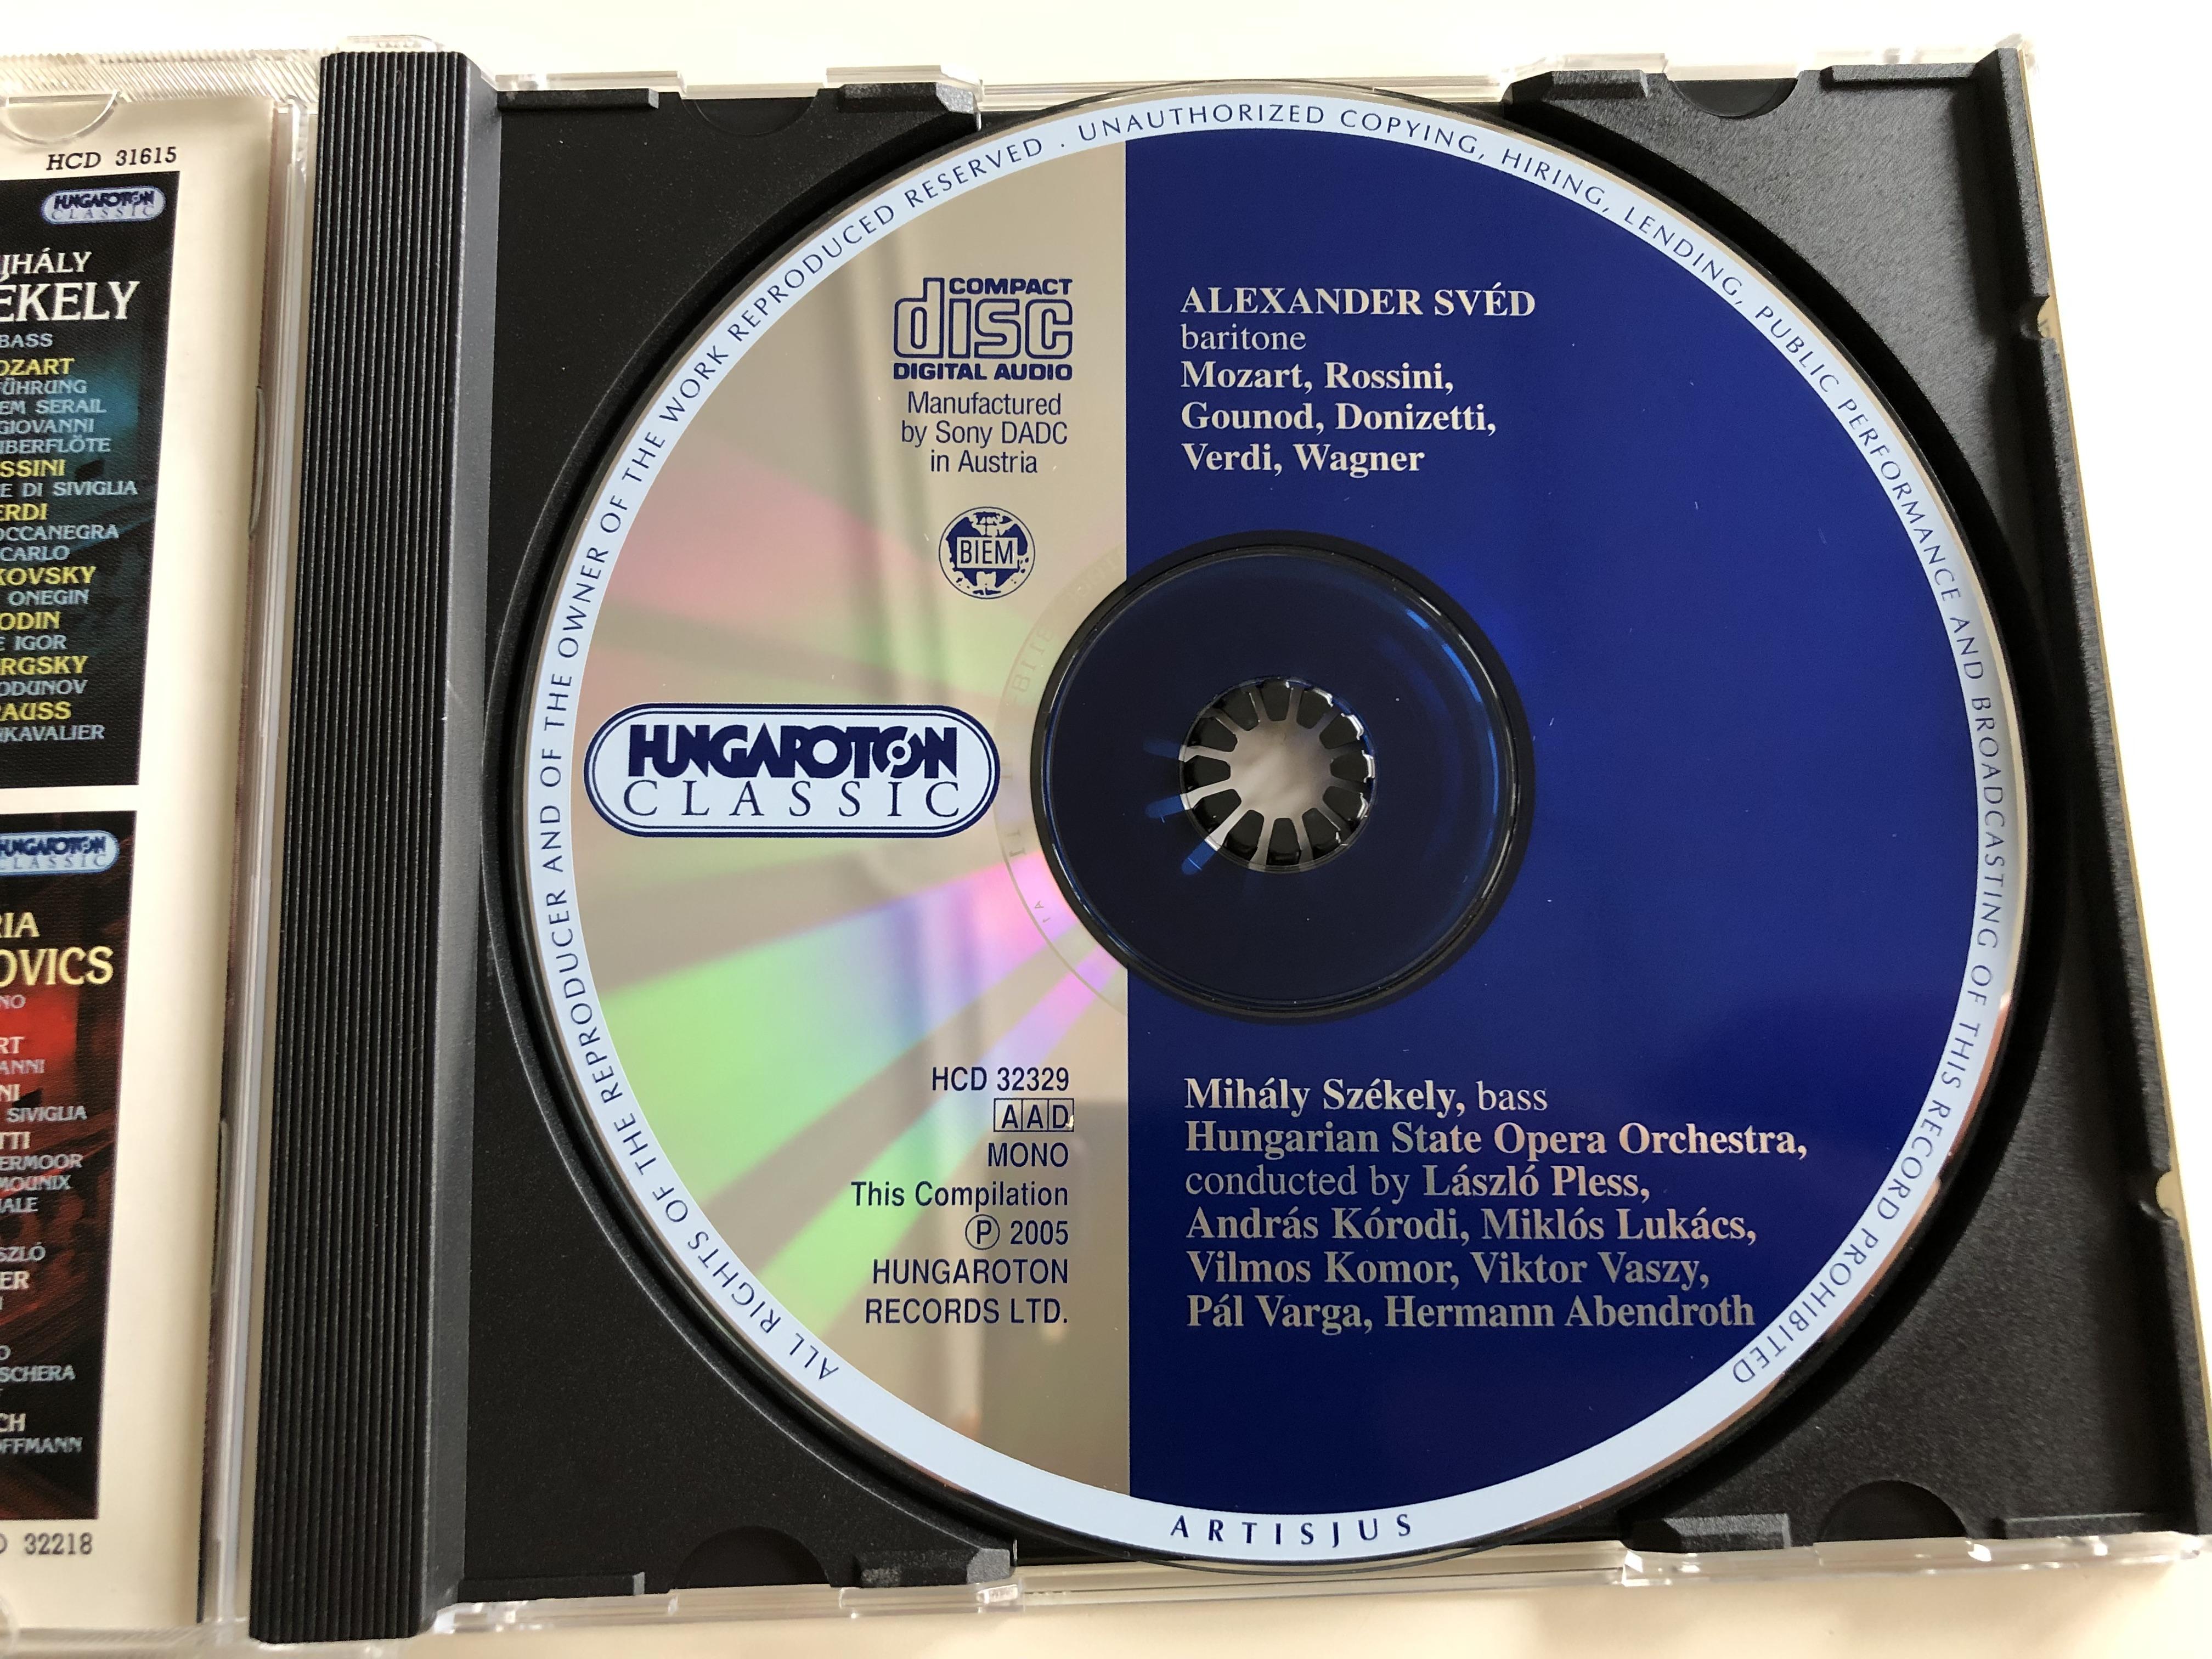 alexander-sv-d-baritone-audio-cd-2005-mozart-rossini-gounod-donizetti-verdi-wagner-hungarian-state-opera-orchestra-hungaroton-classic-hcd-32329-6-.jpg